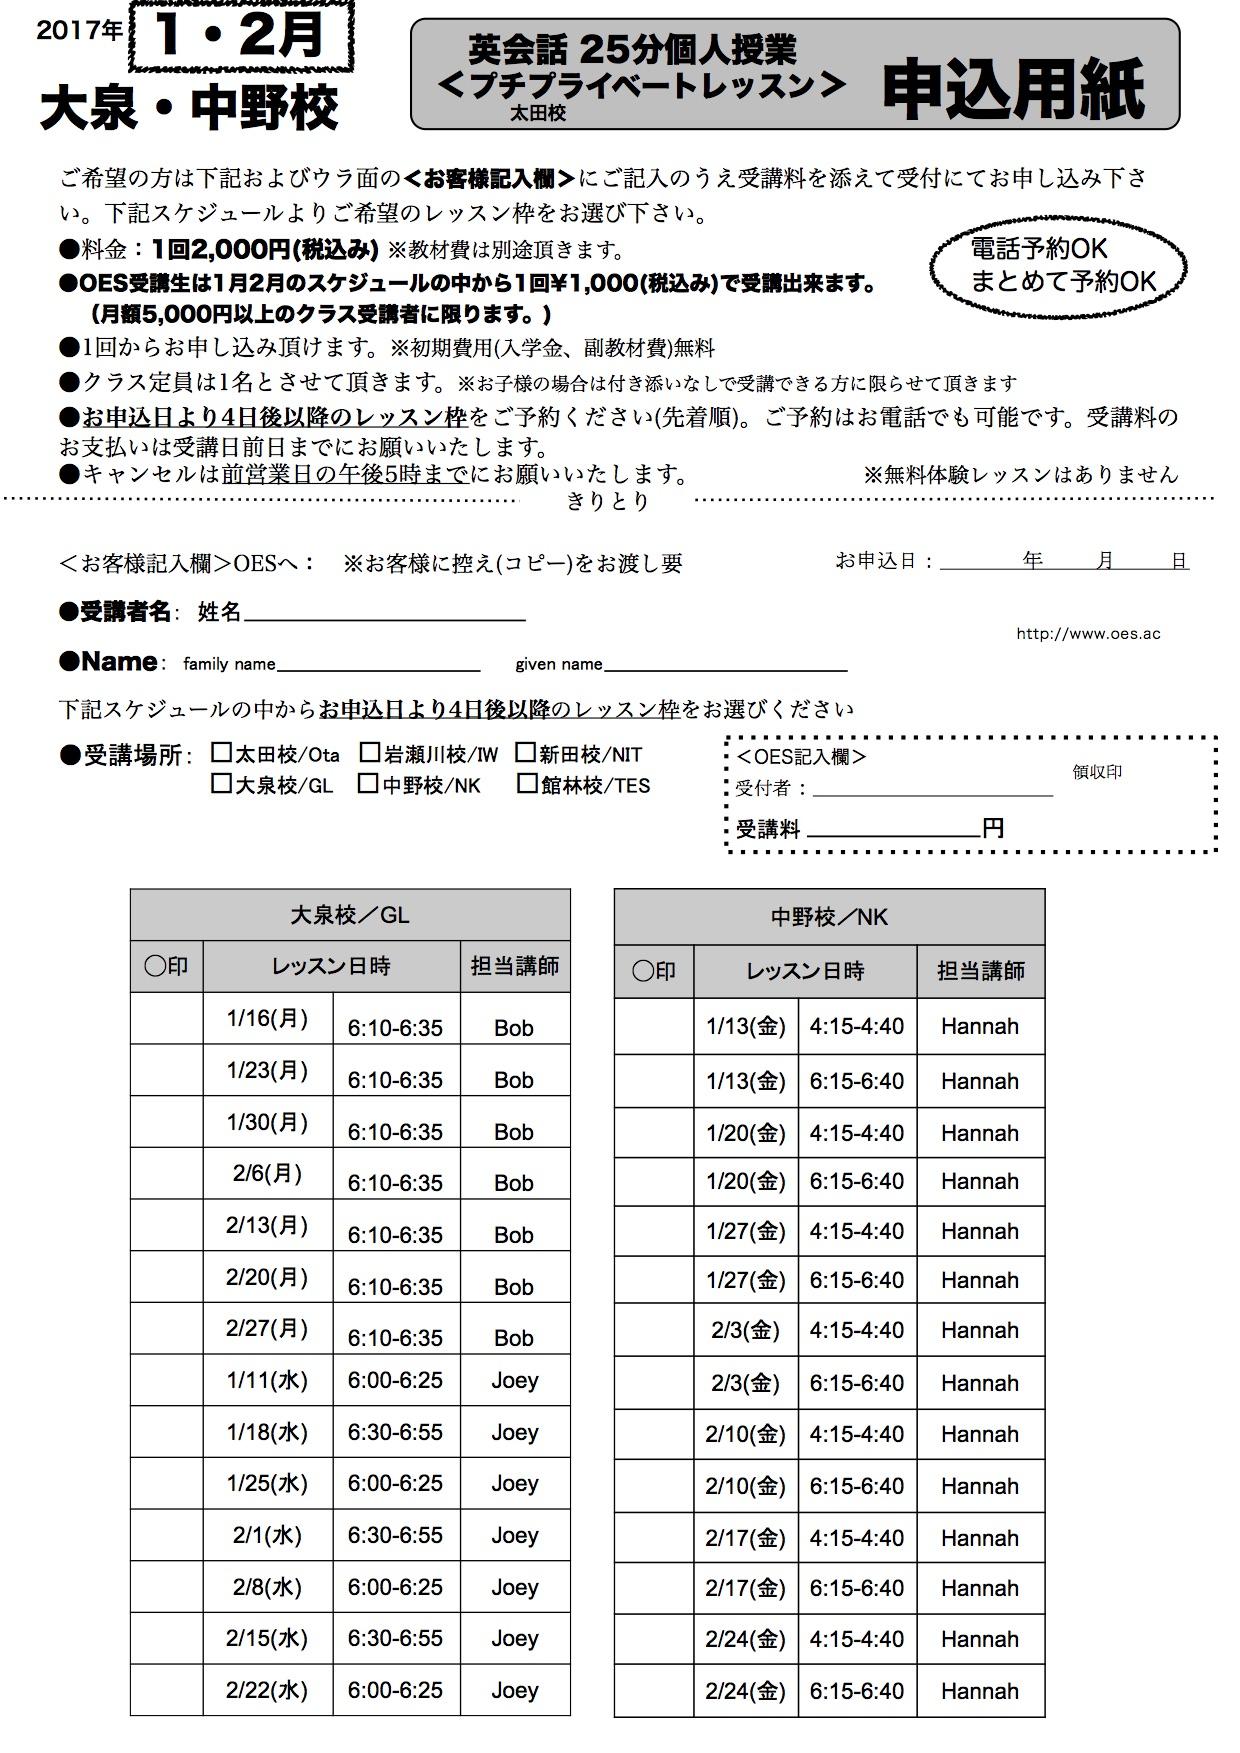 1月2月大泉、中野校プチプラ申込用紙